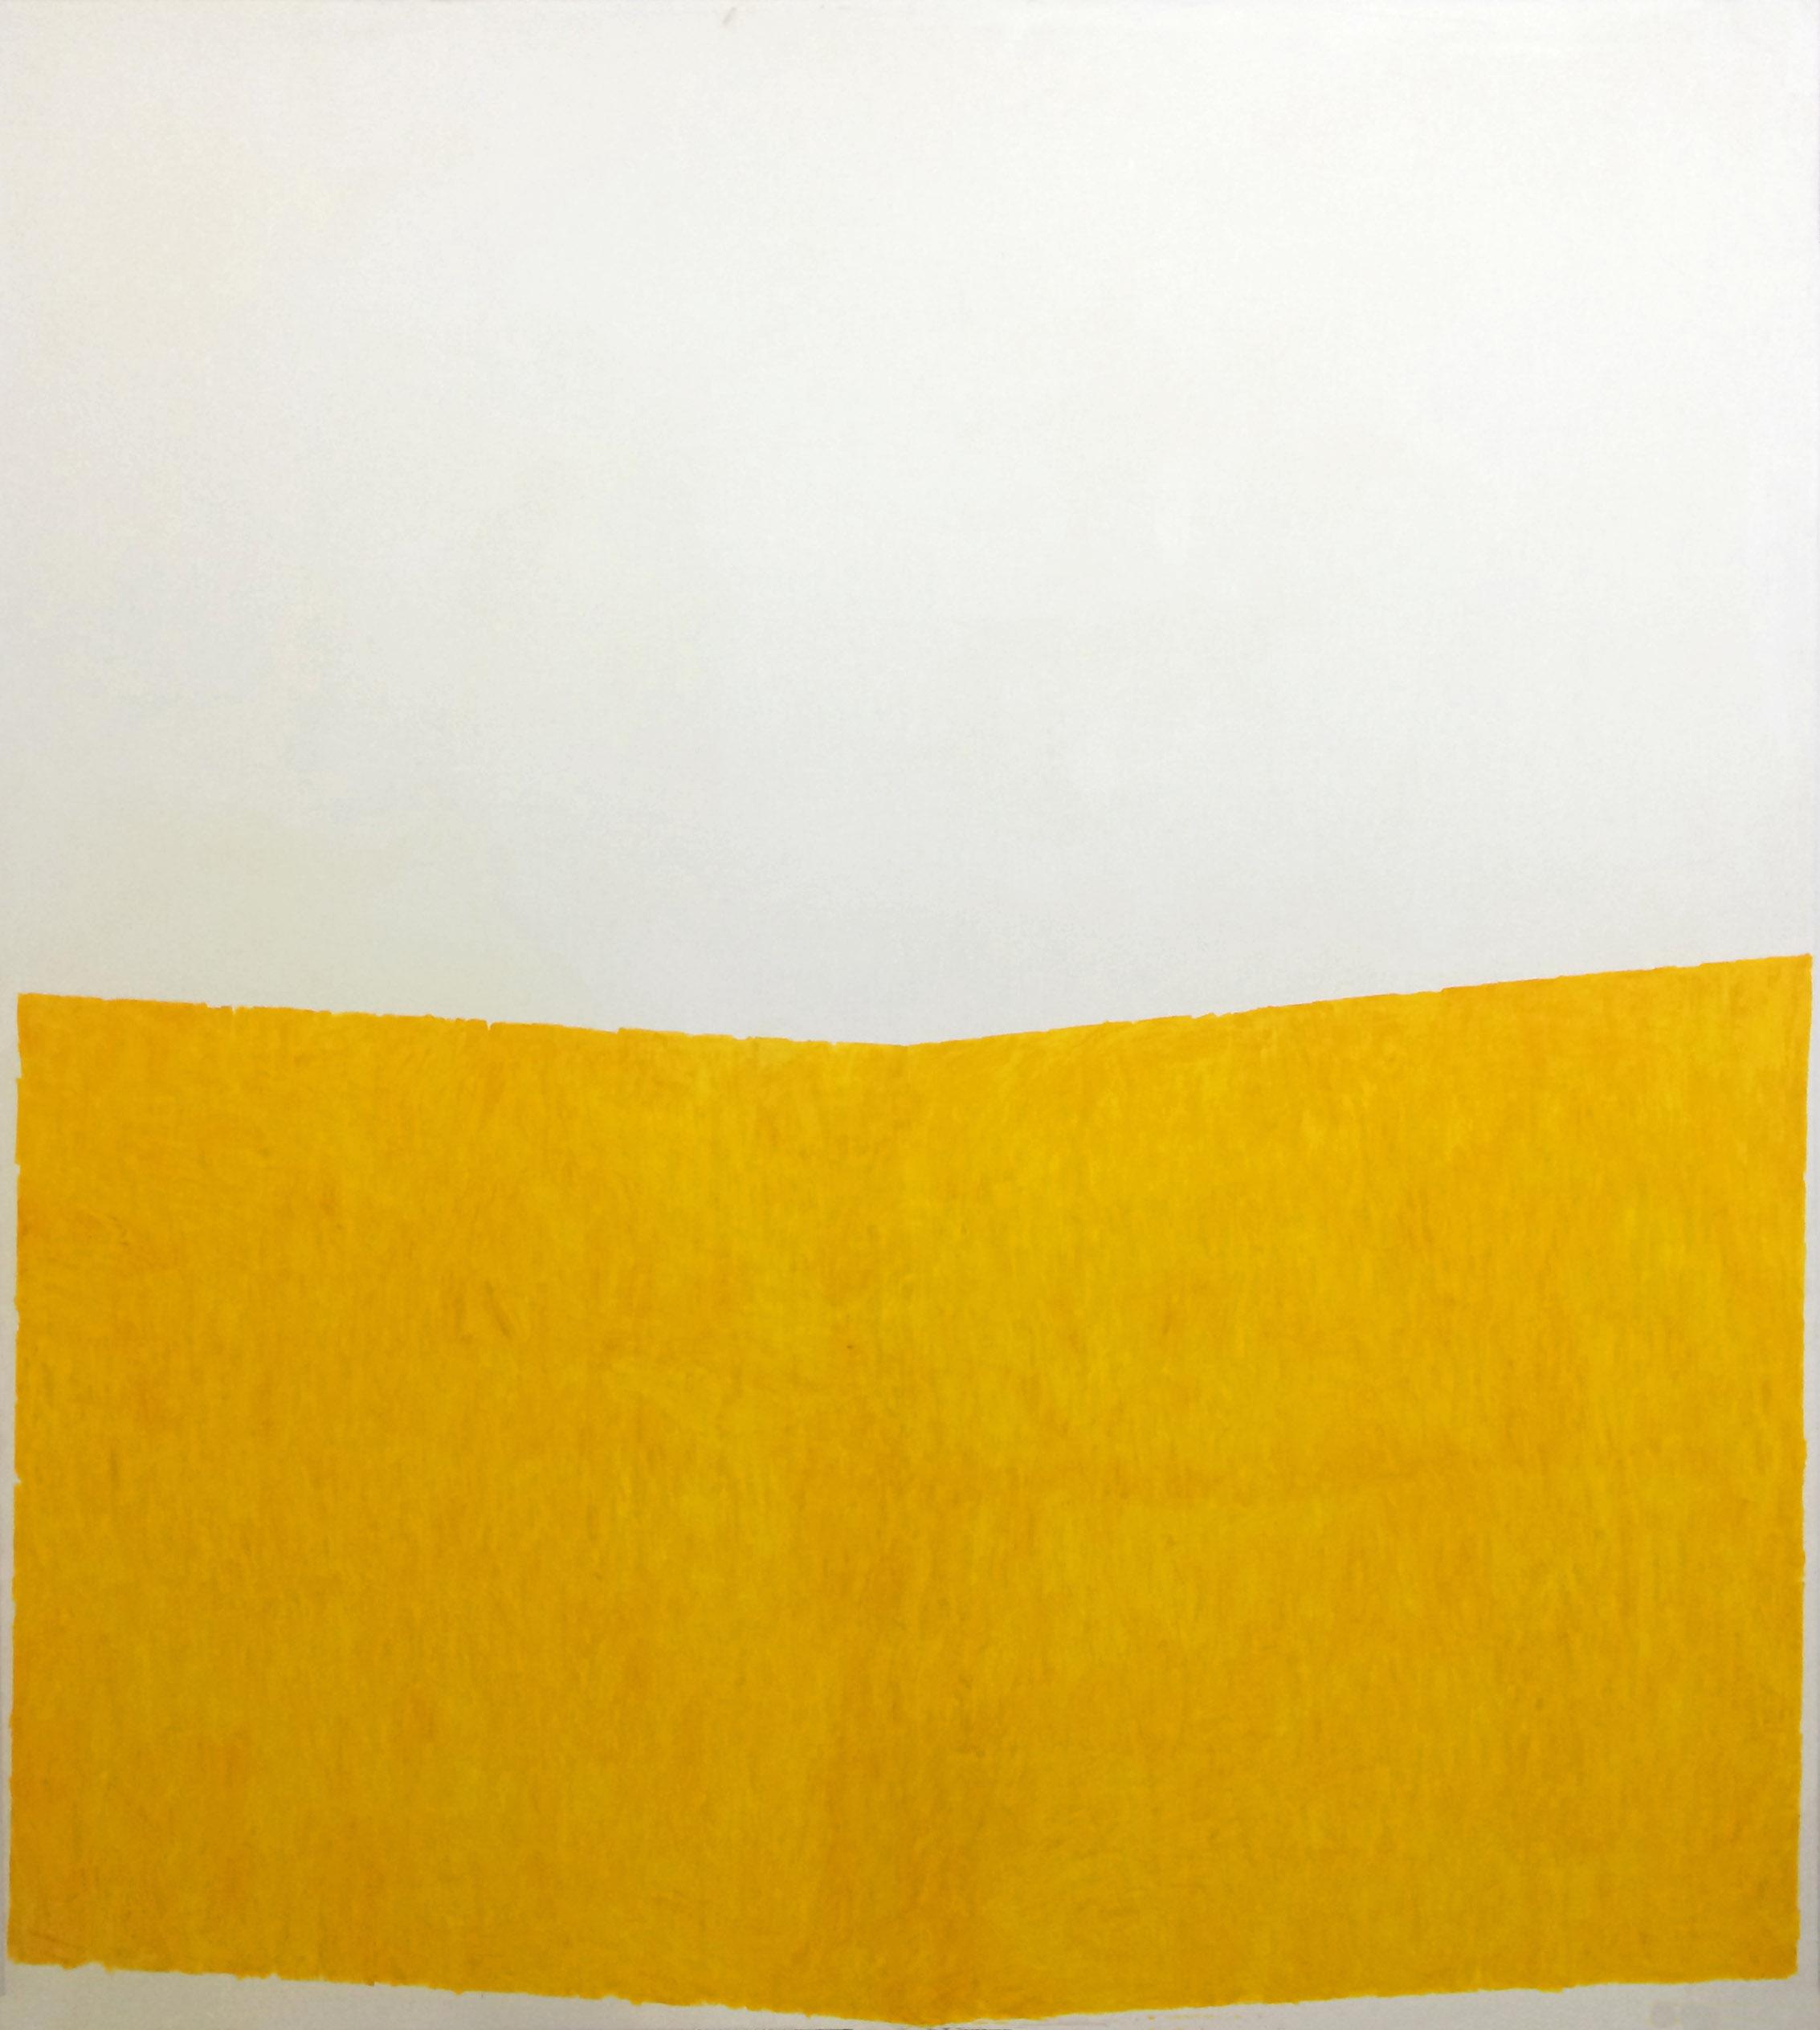 Gesture 1, 190 x 170 cms